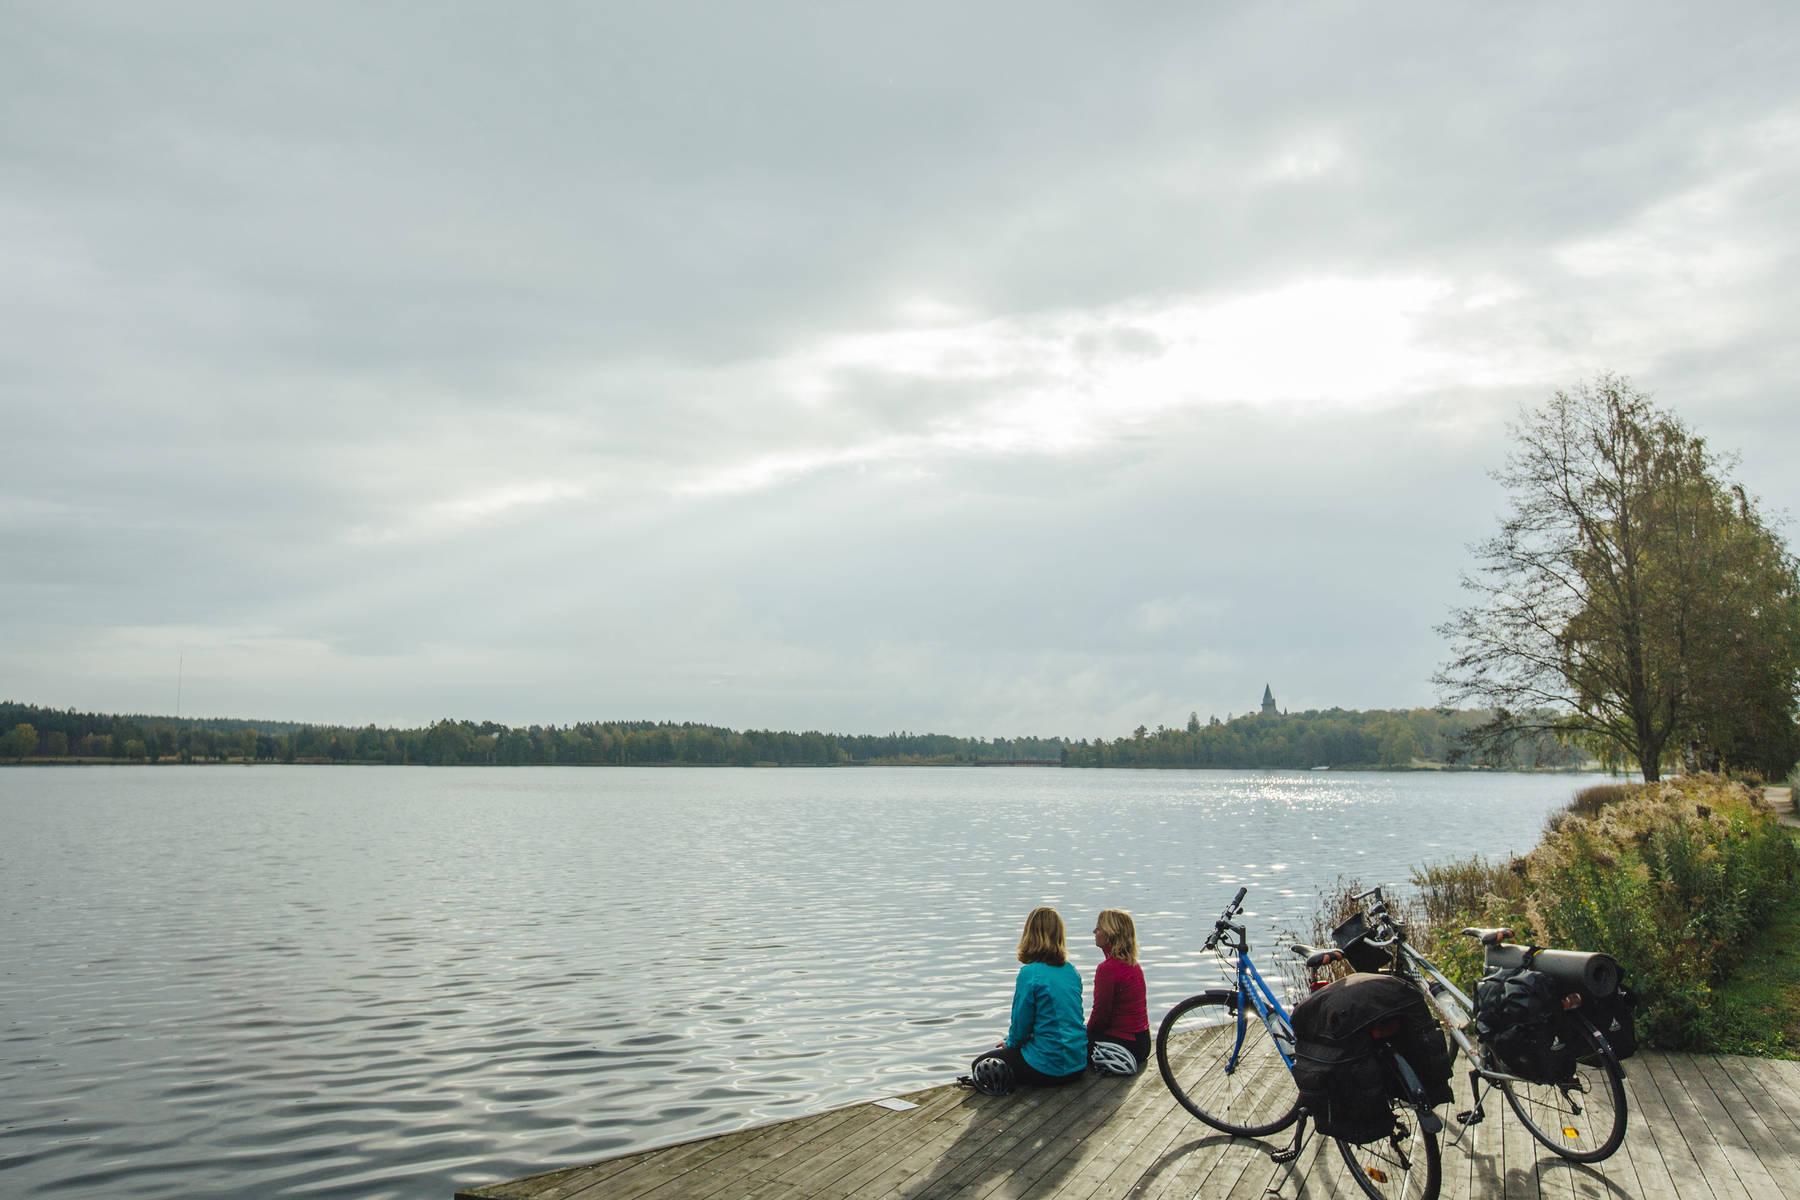 Vy över sjön Trummen i Växjö